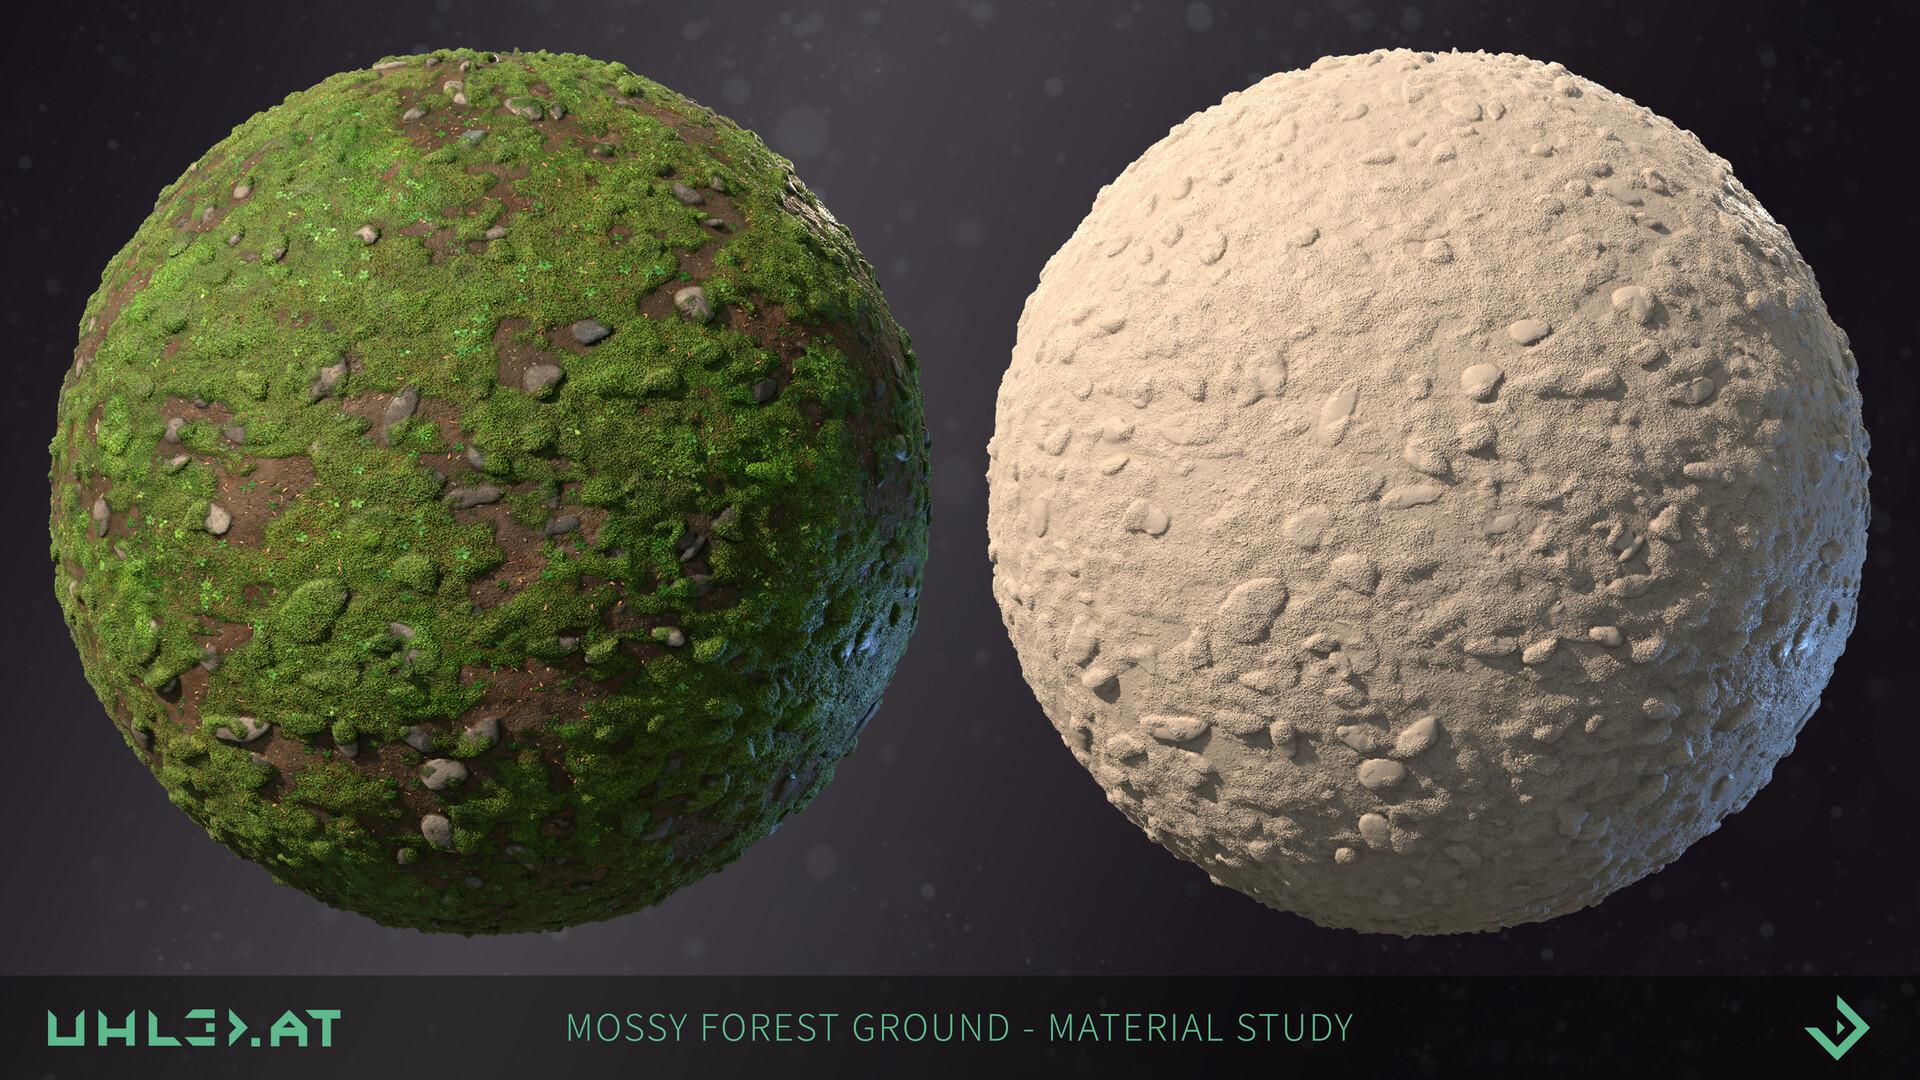 Dominik uhl mossy forest ground 01